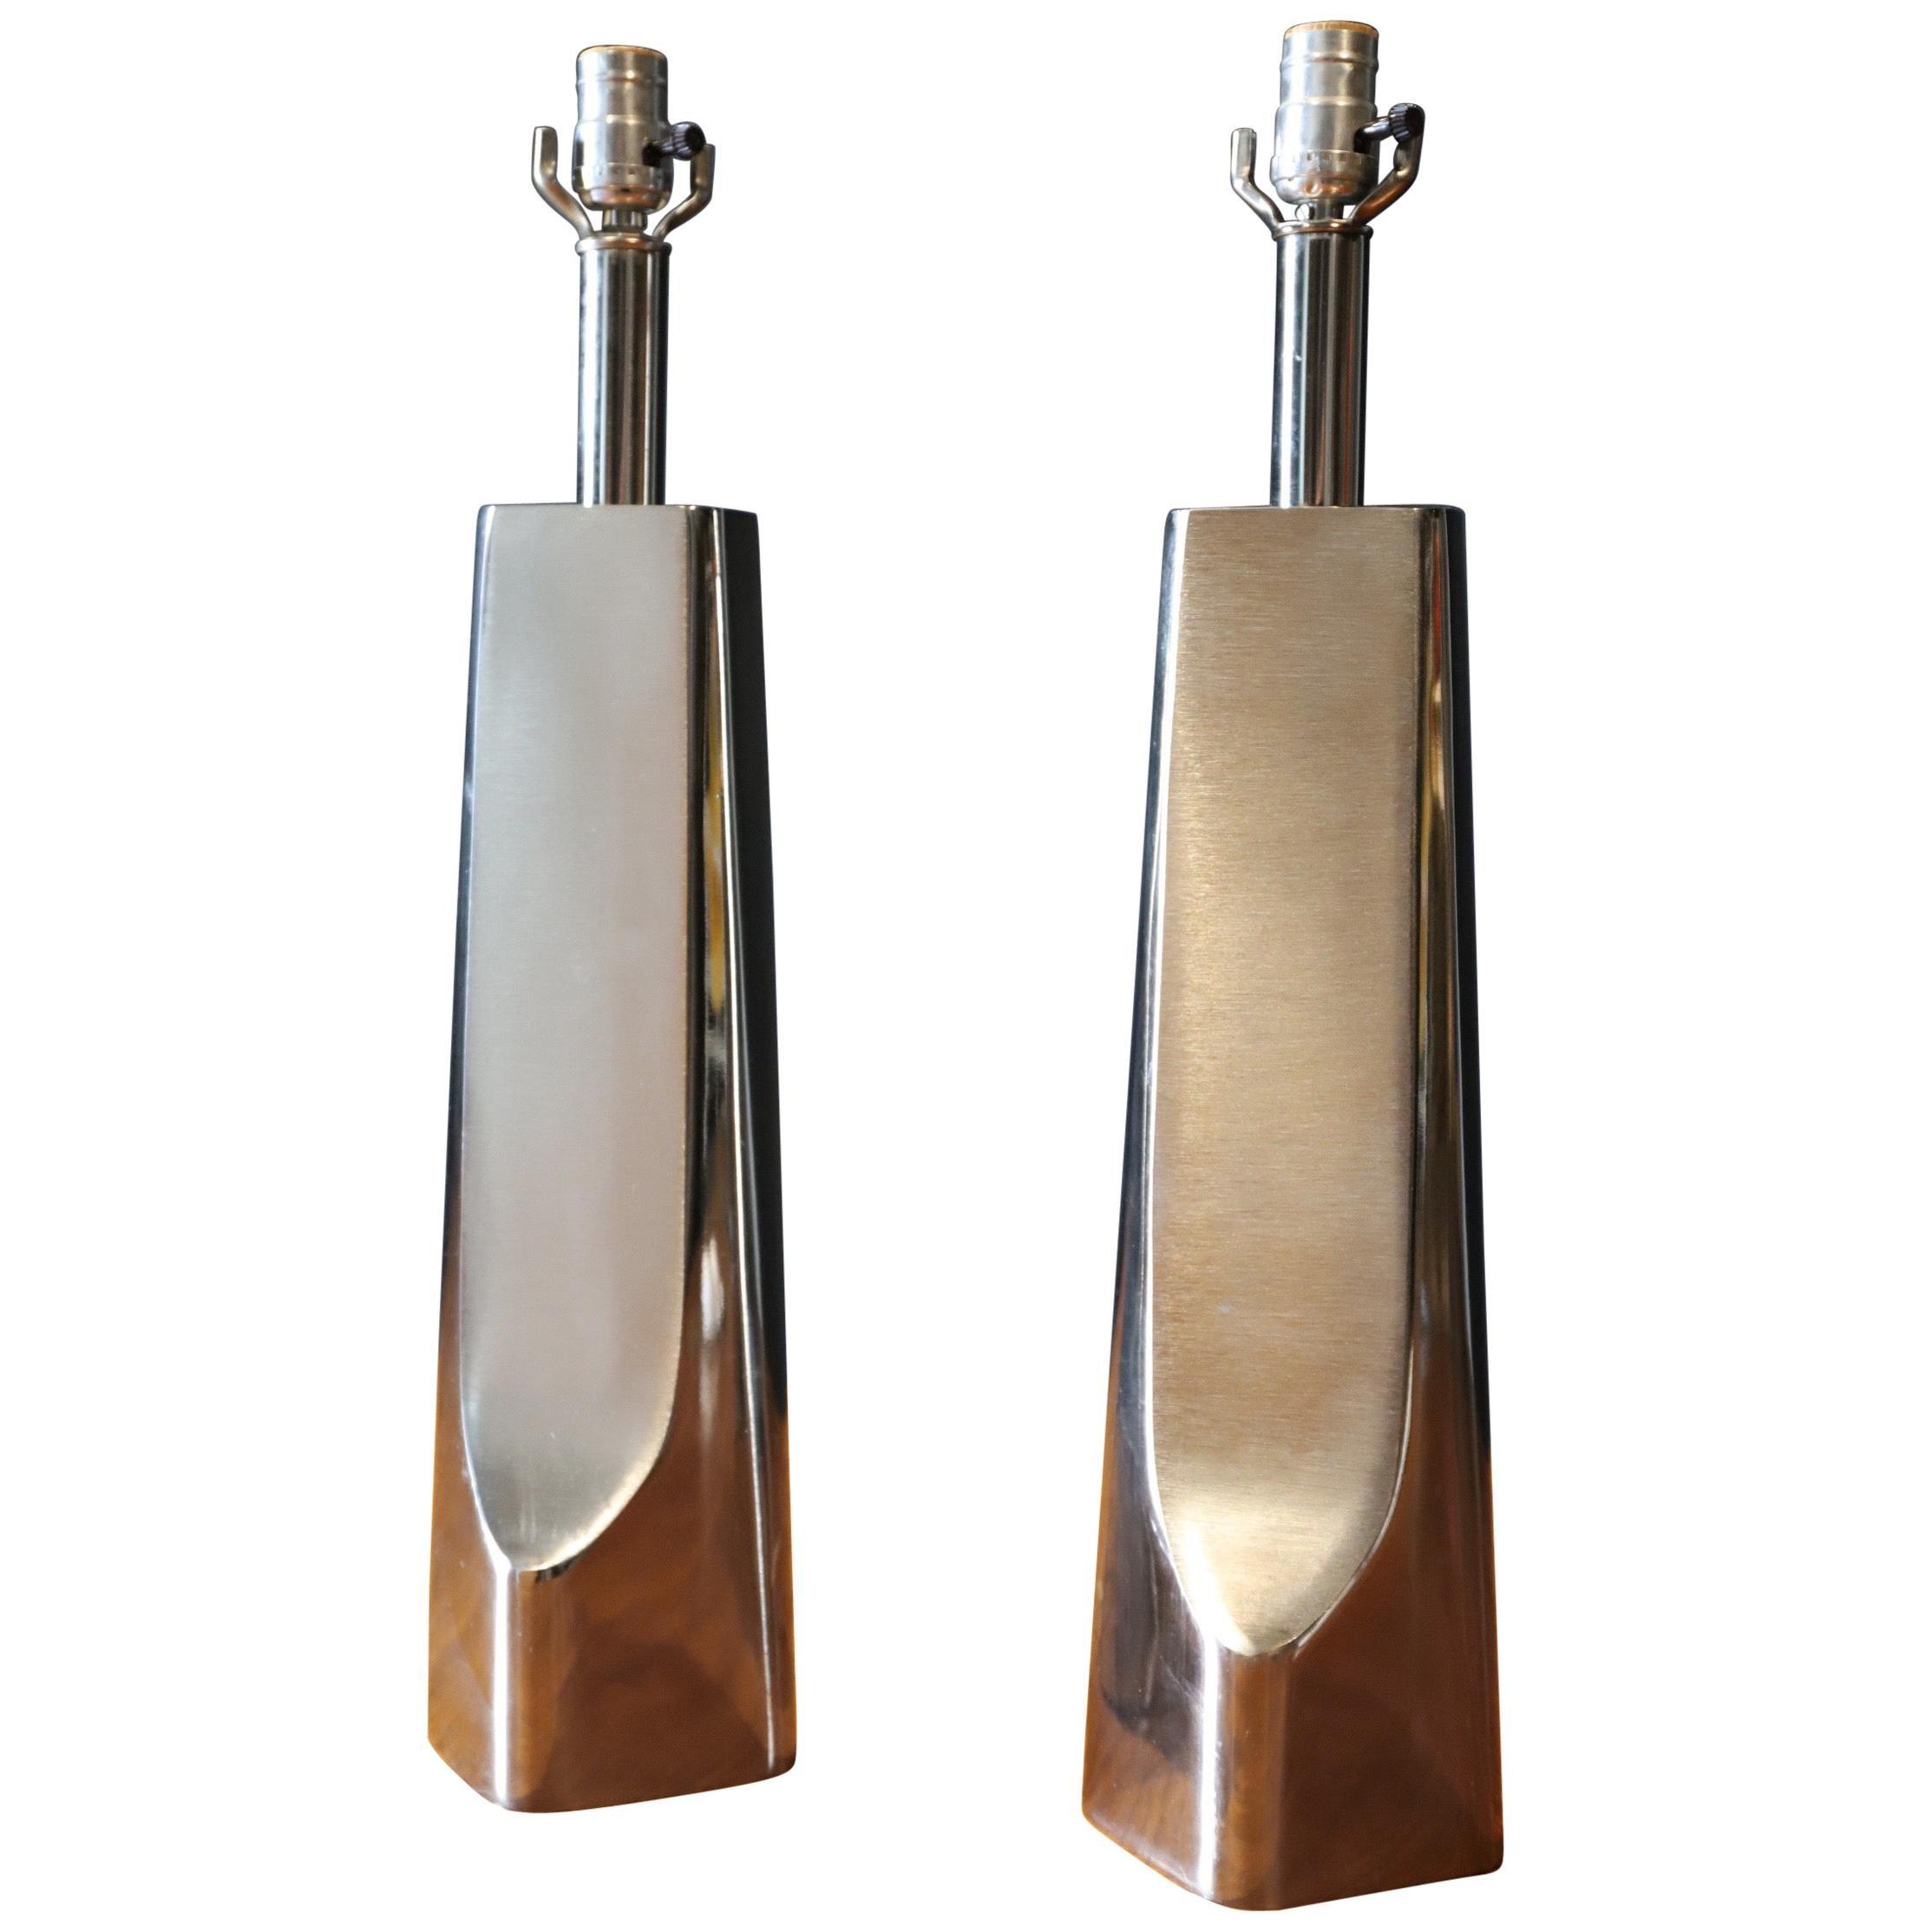 Pair of Modern Lamps by Laurel Lamp Co